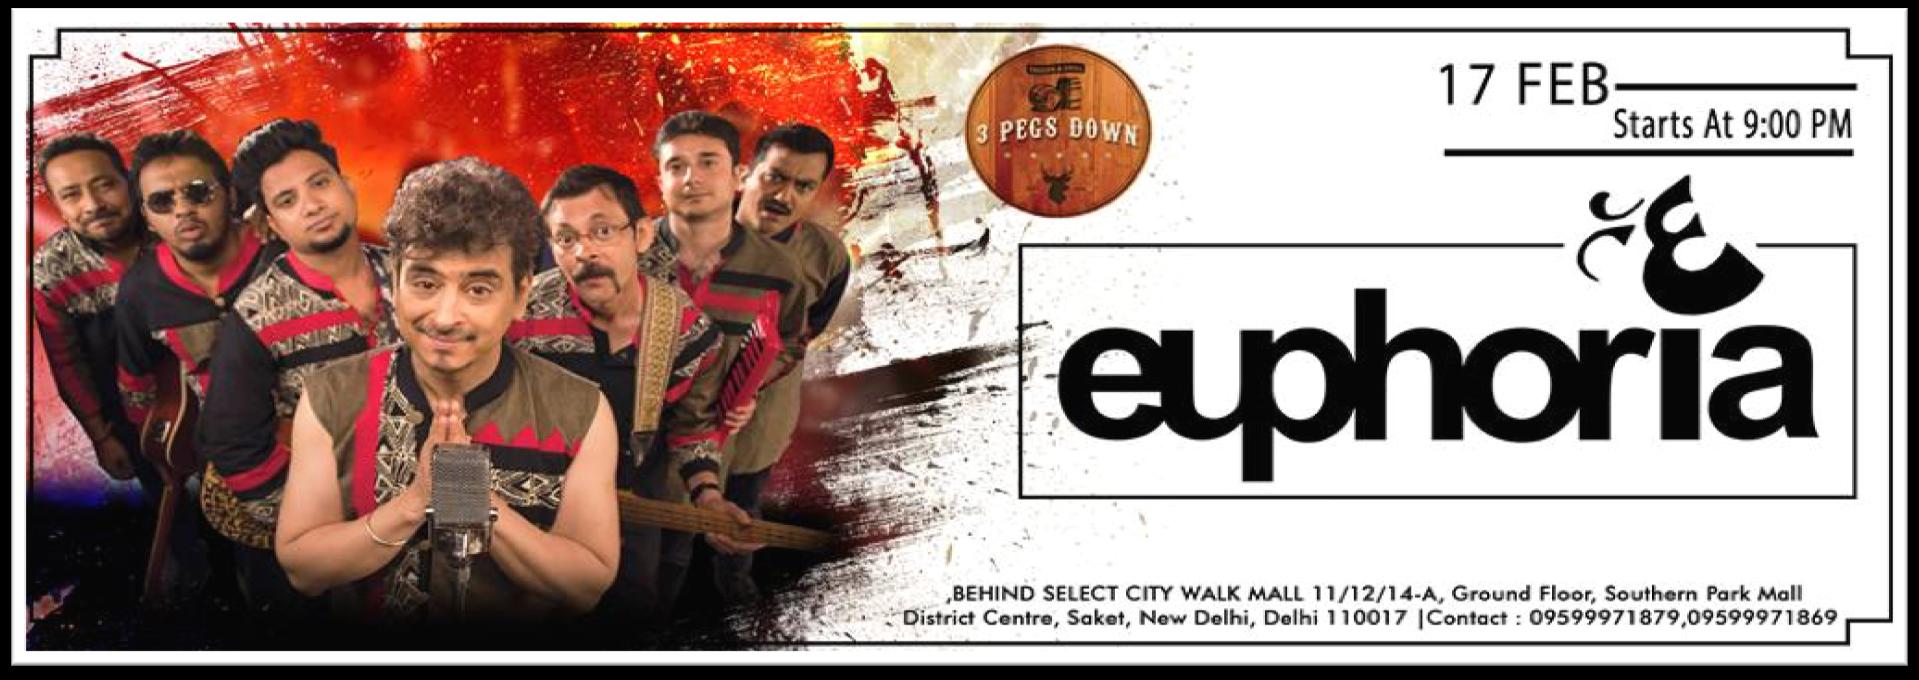 3 Pegs Down Event - Euphoria